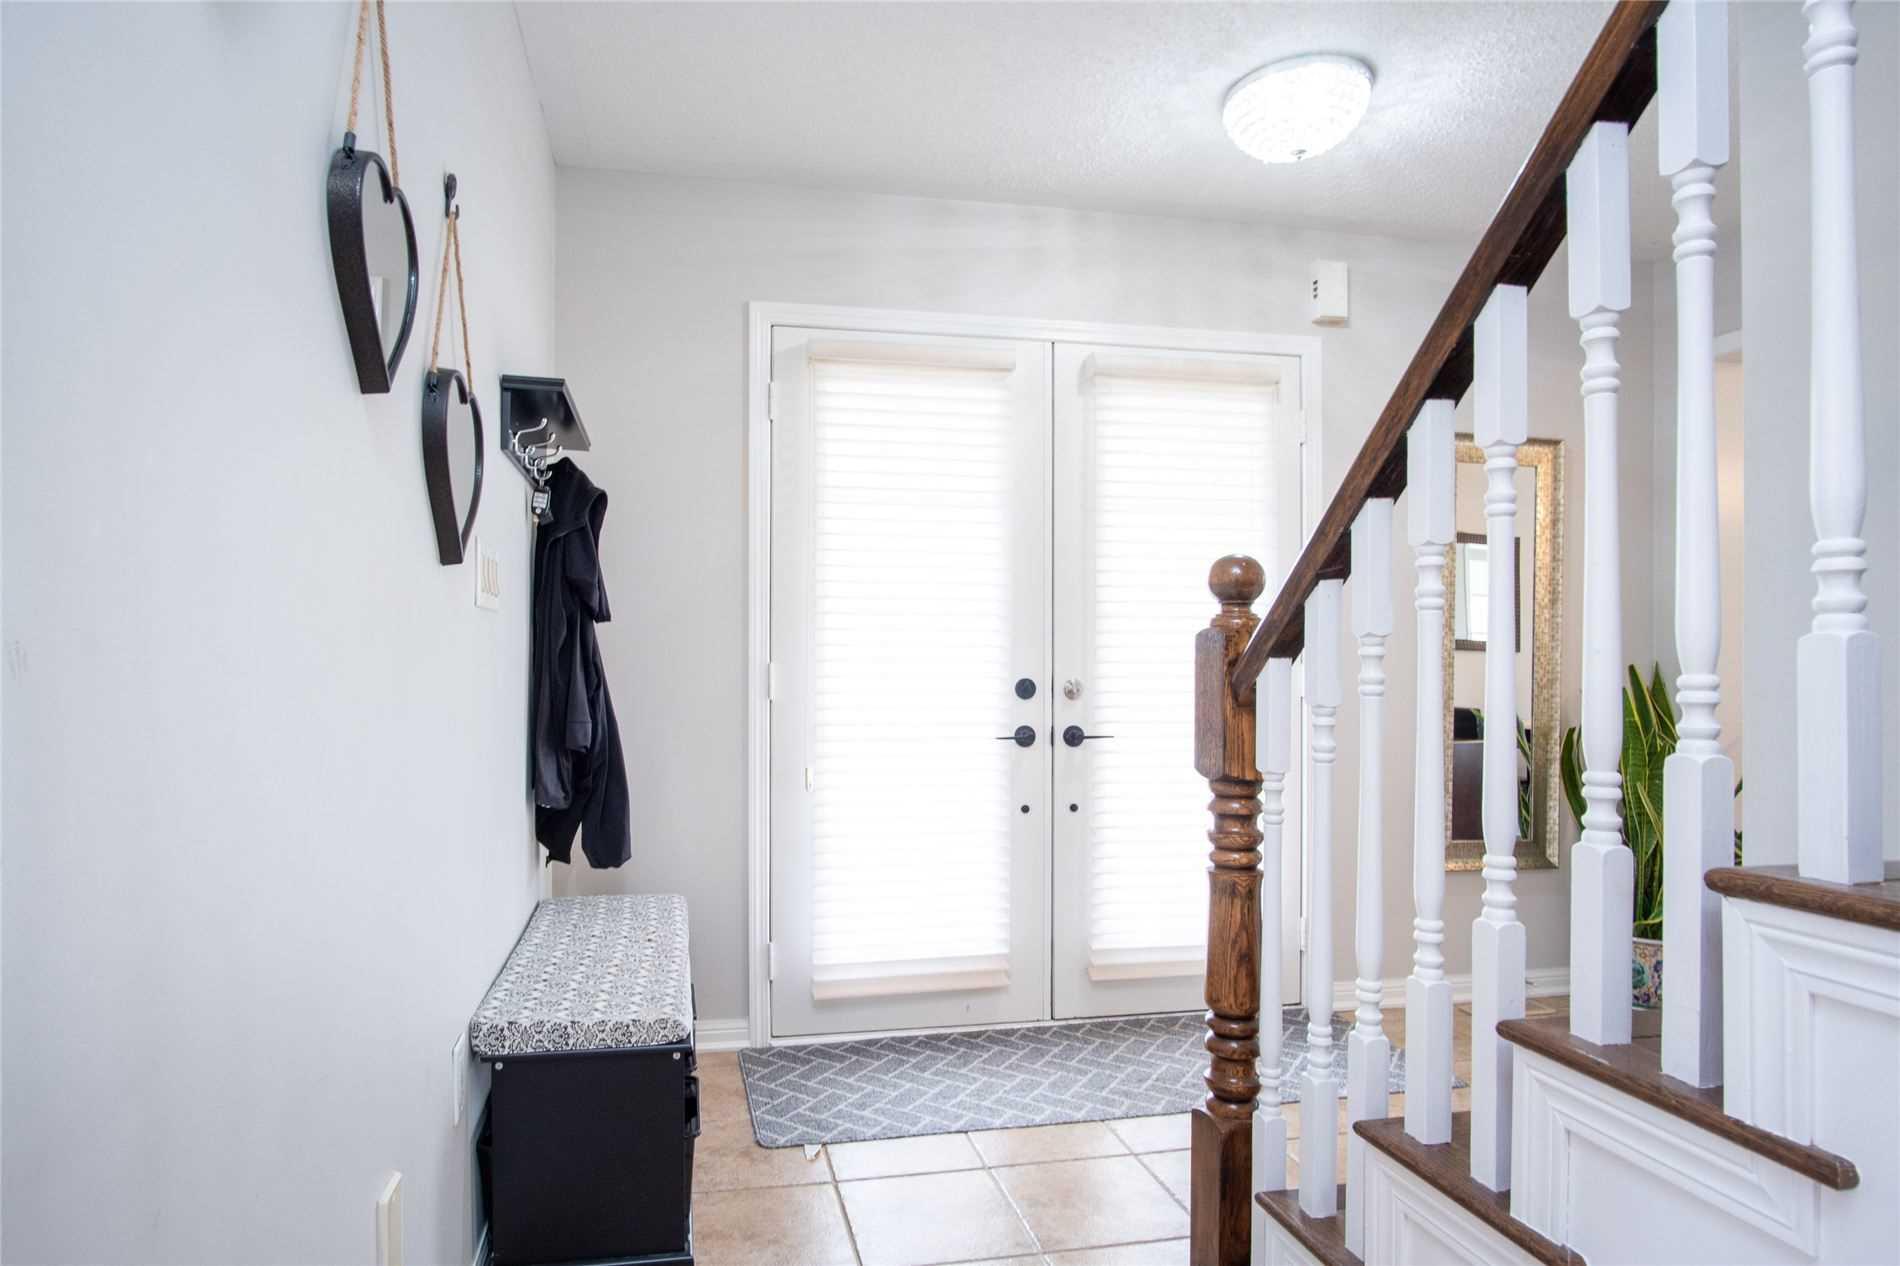 827 Biggar Hts - Coates Detached for sale, 4 Bedrooms (W5400280) - #4